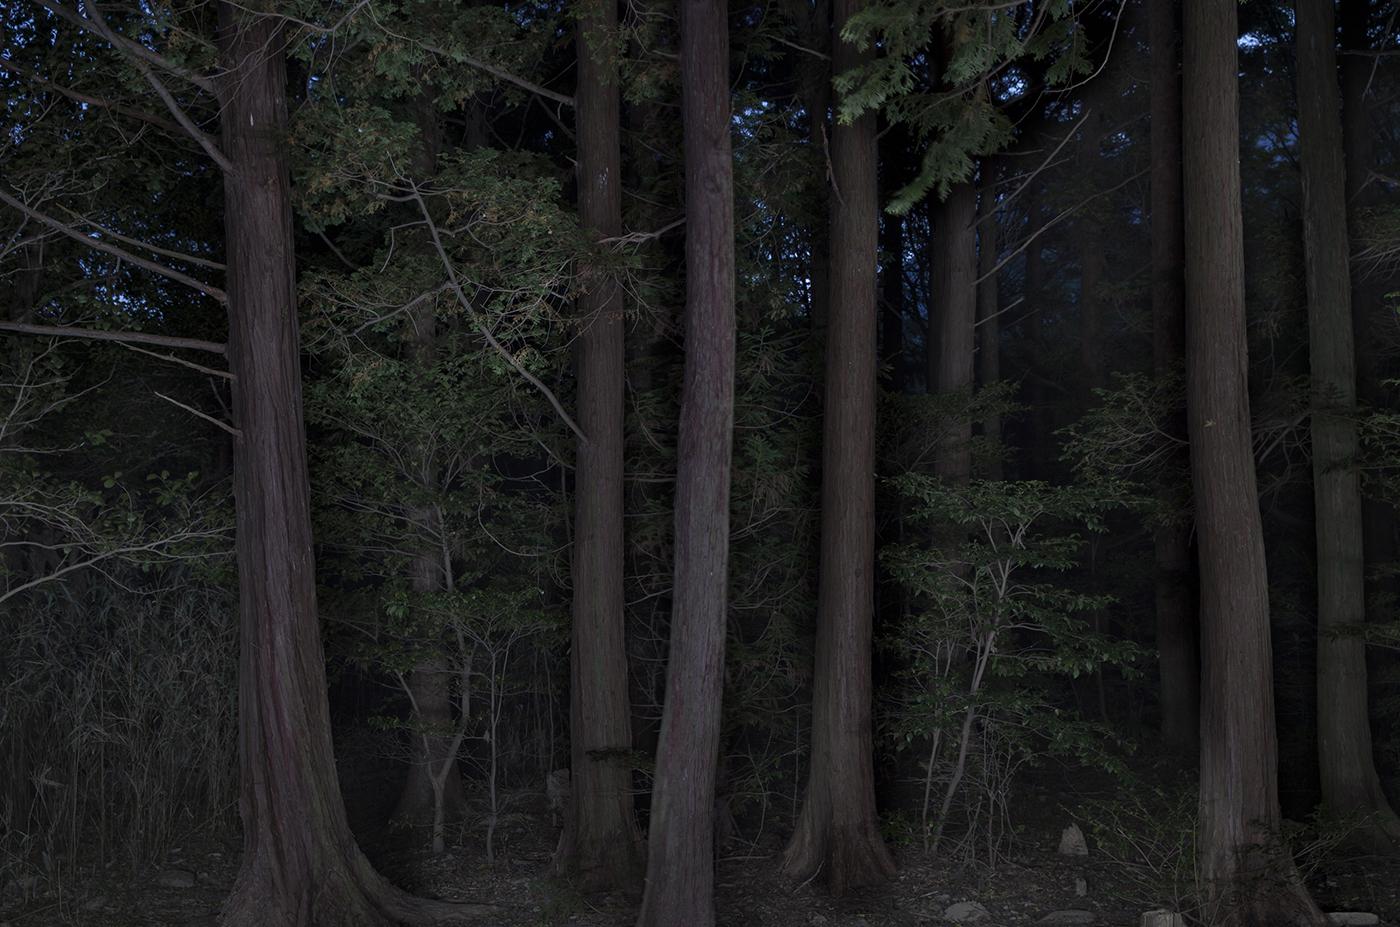 Taejoong Kim,Foresta #7,2013